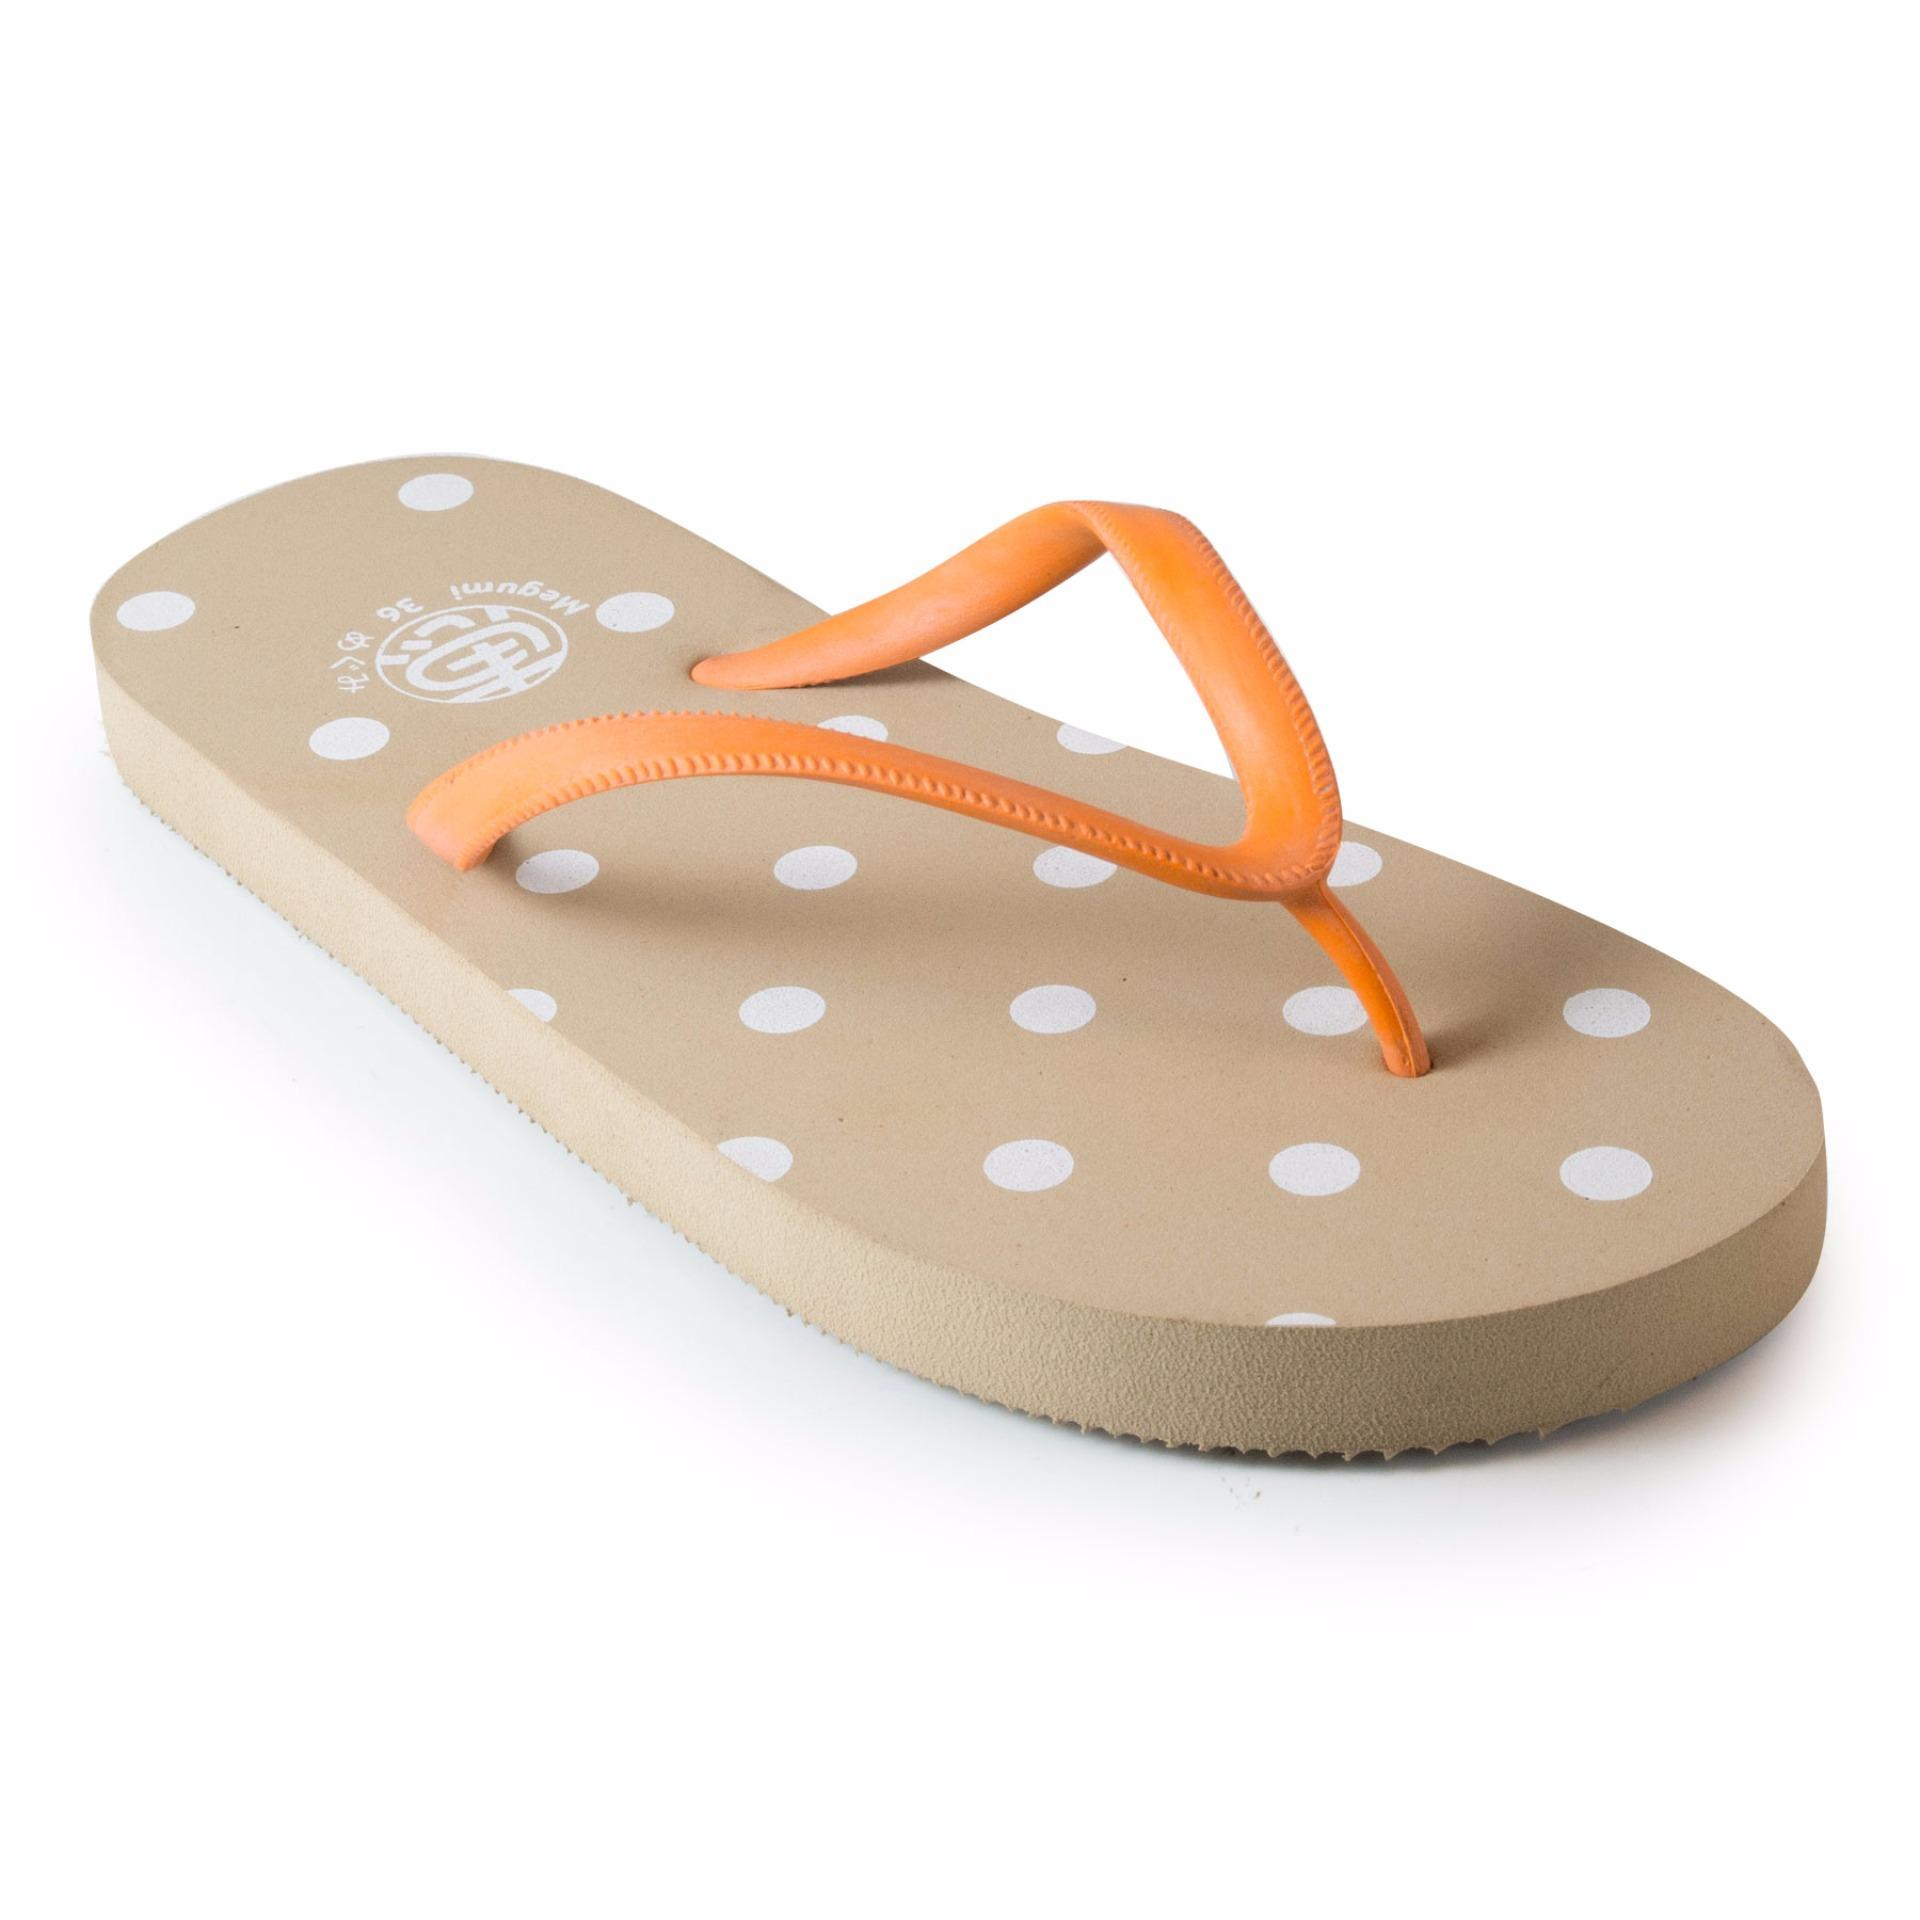 Spesifikasi Megumi Polkadot Sandal Jepit Cream Merk Megumi Sandal